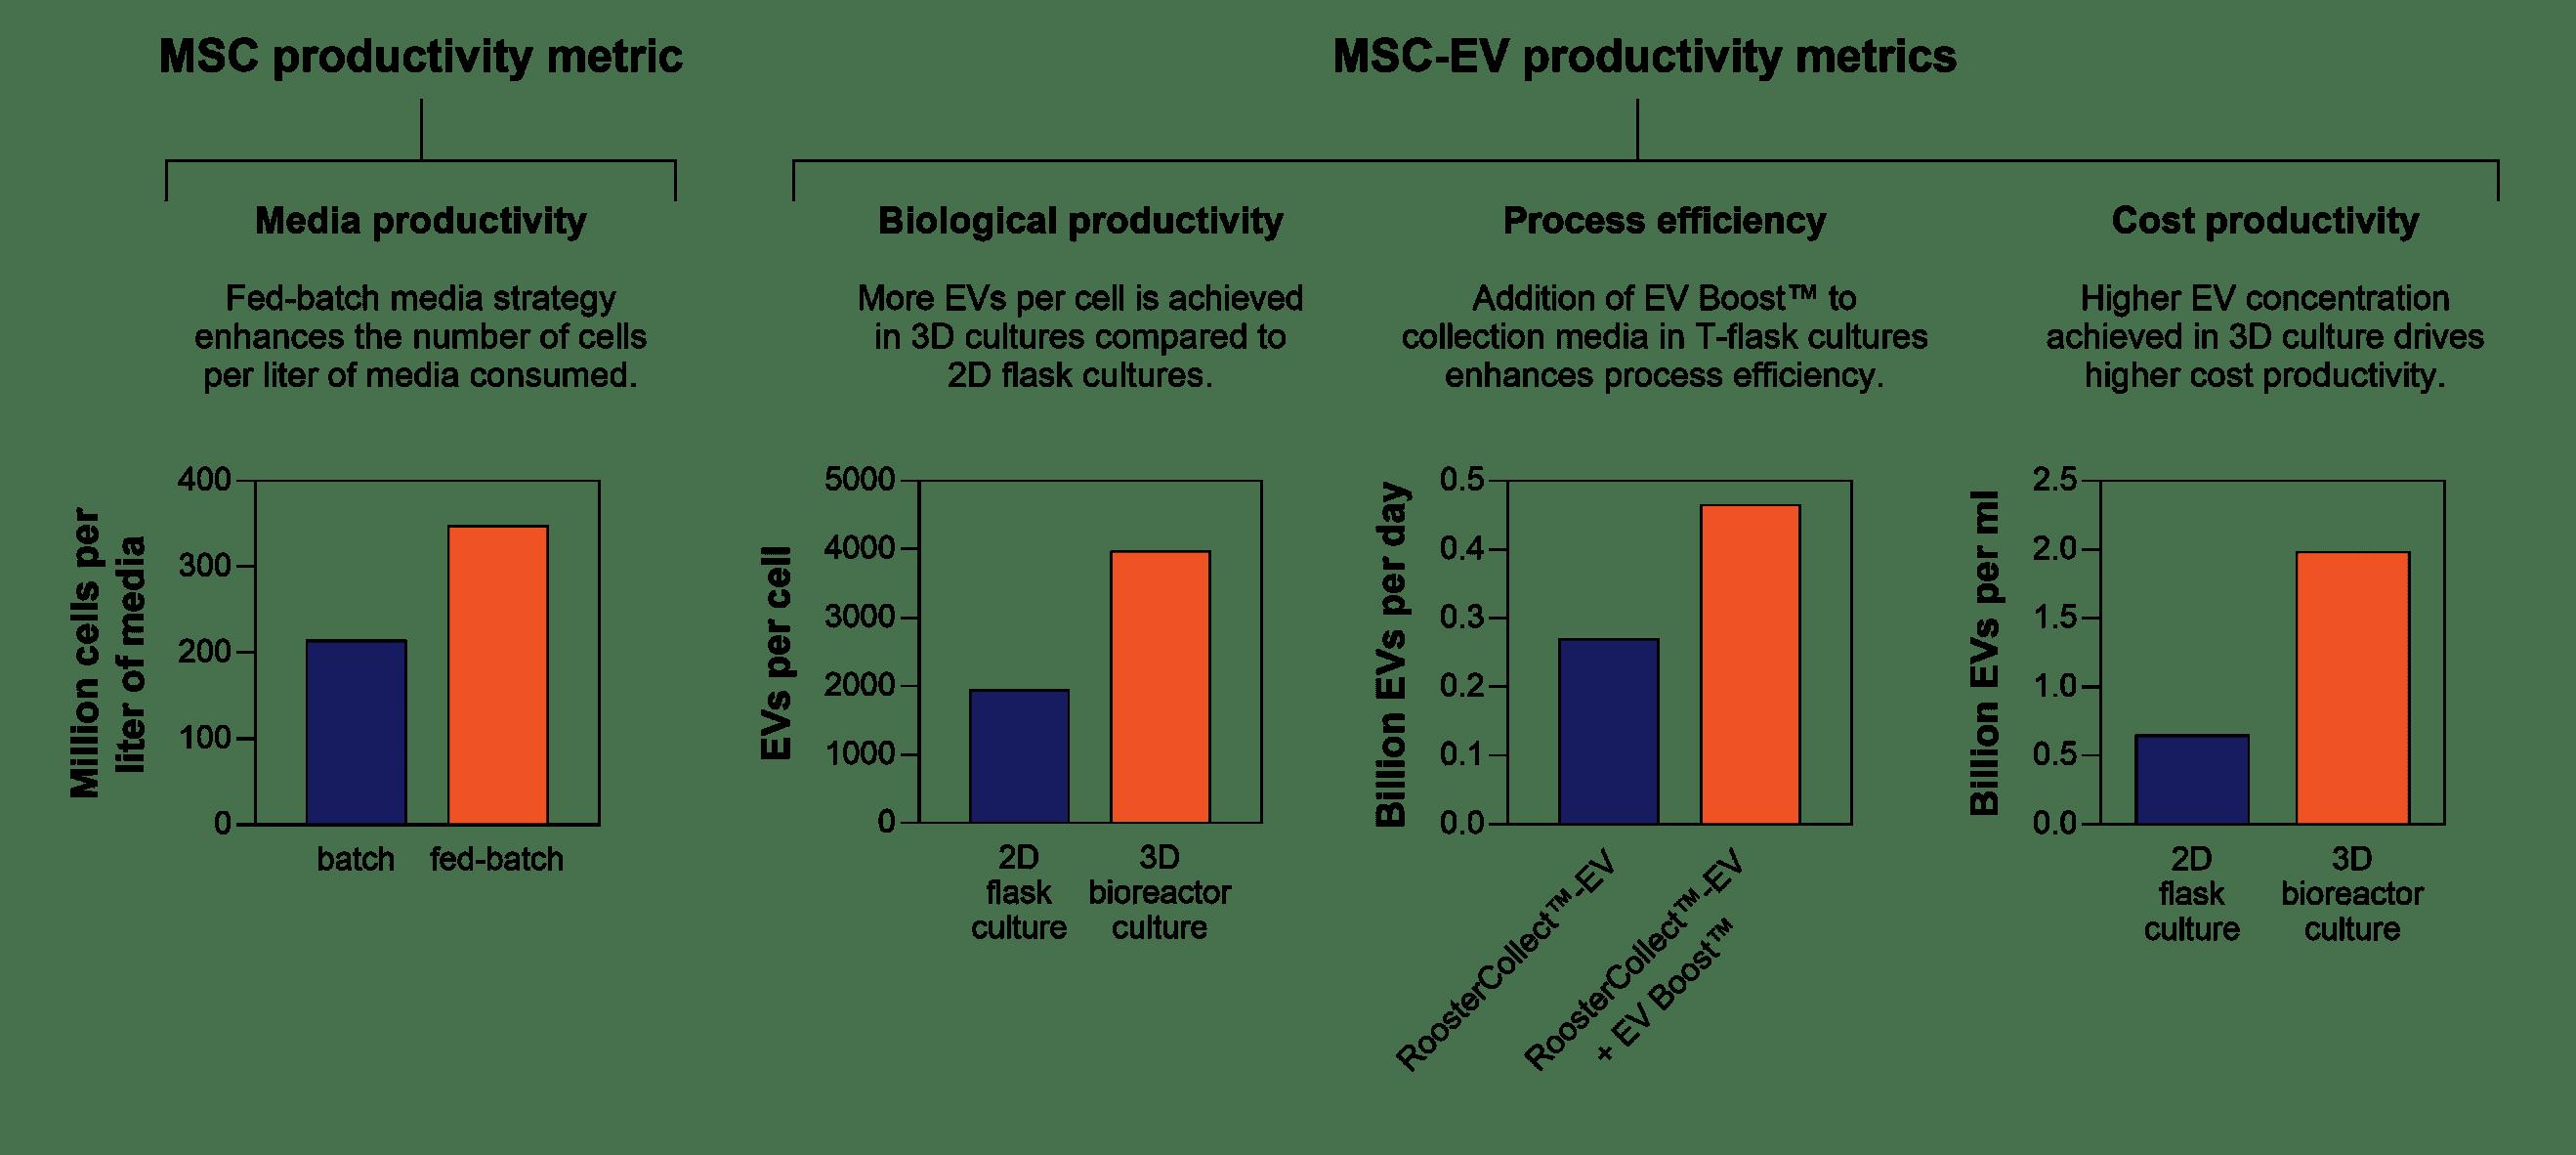 MSC Productivity Metrics